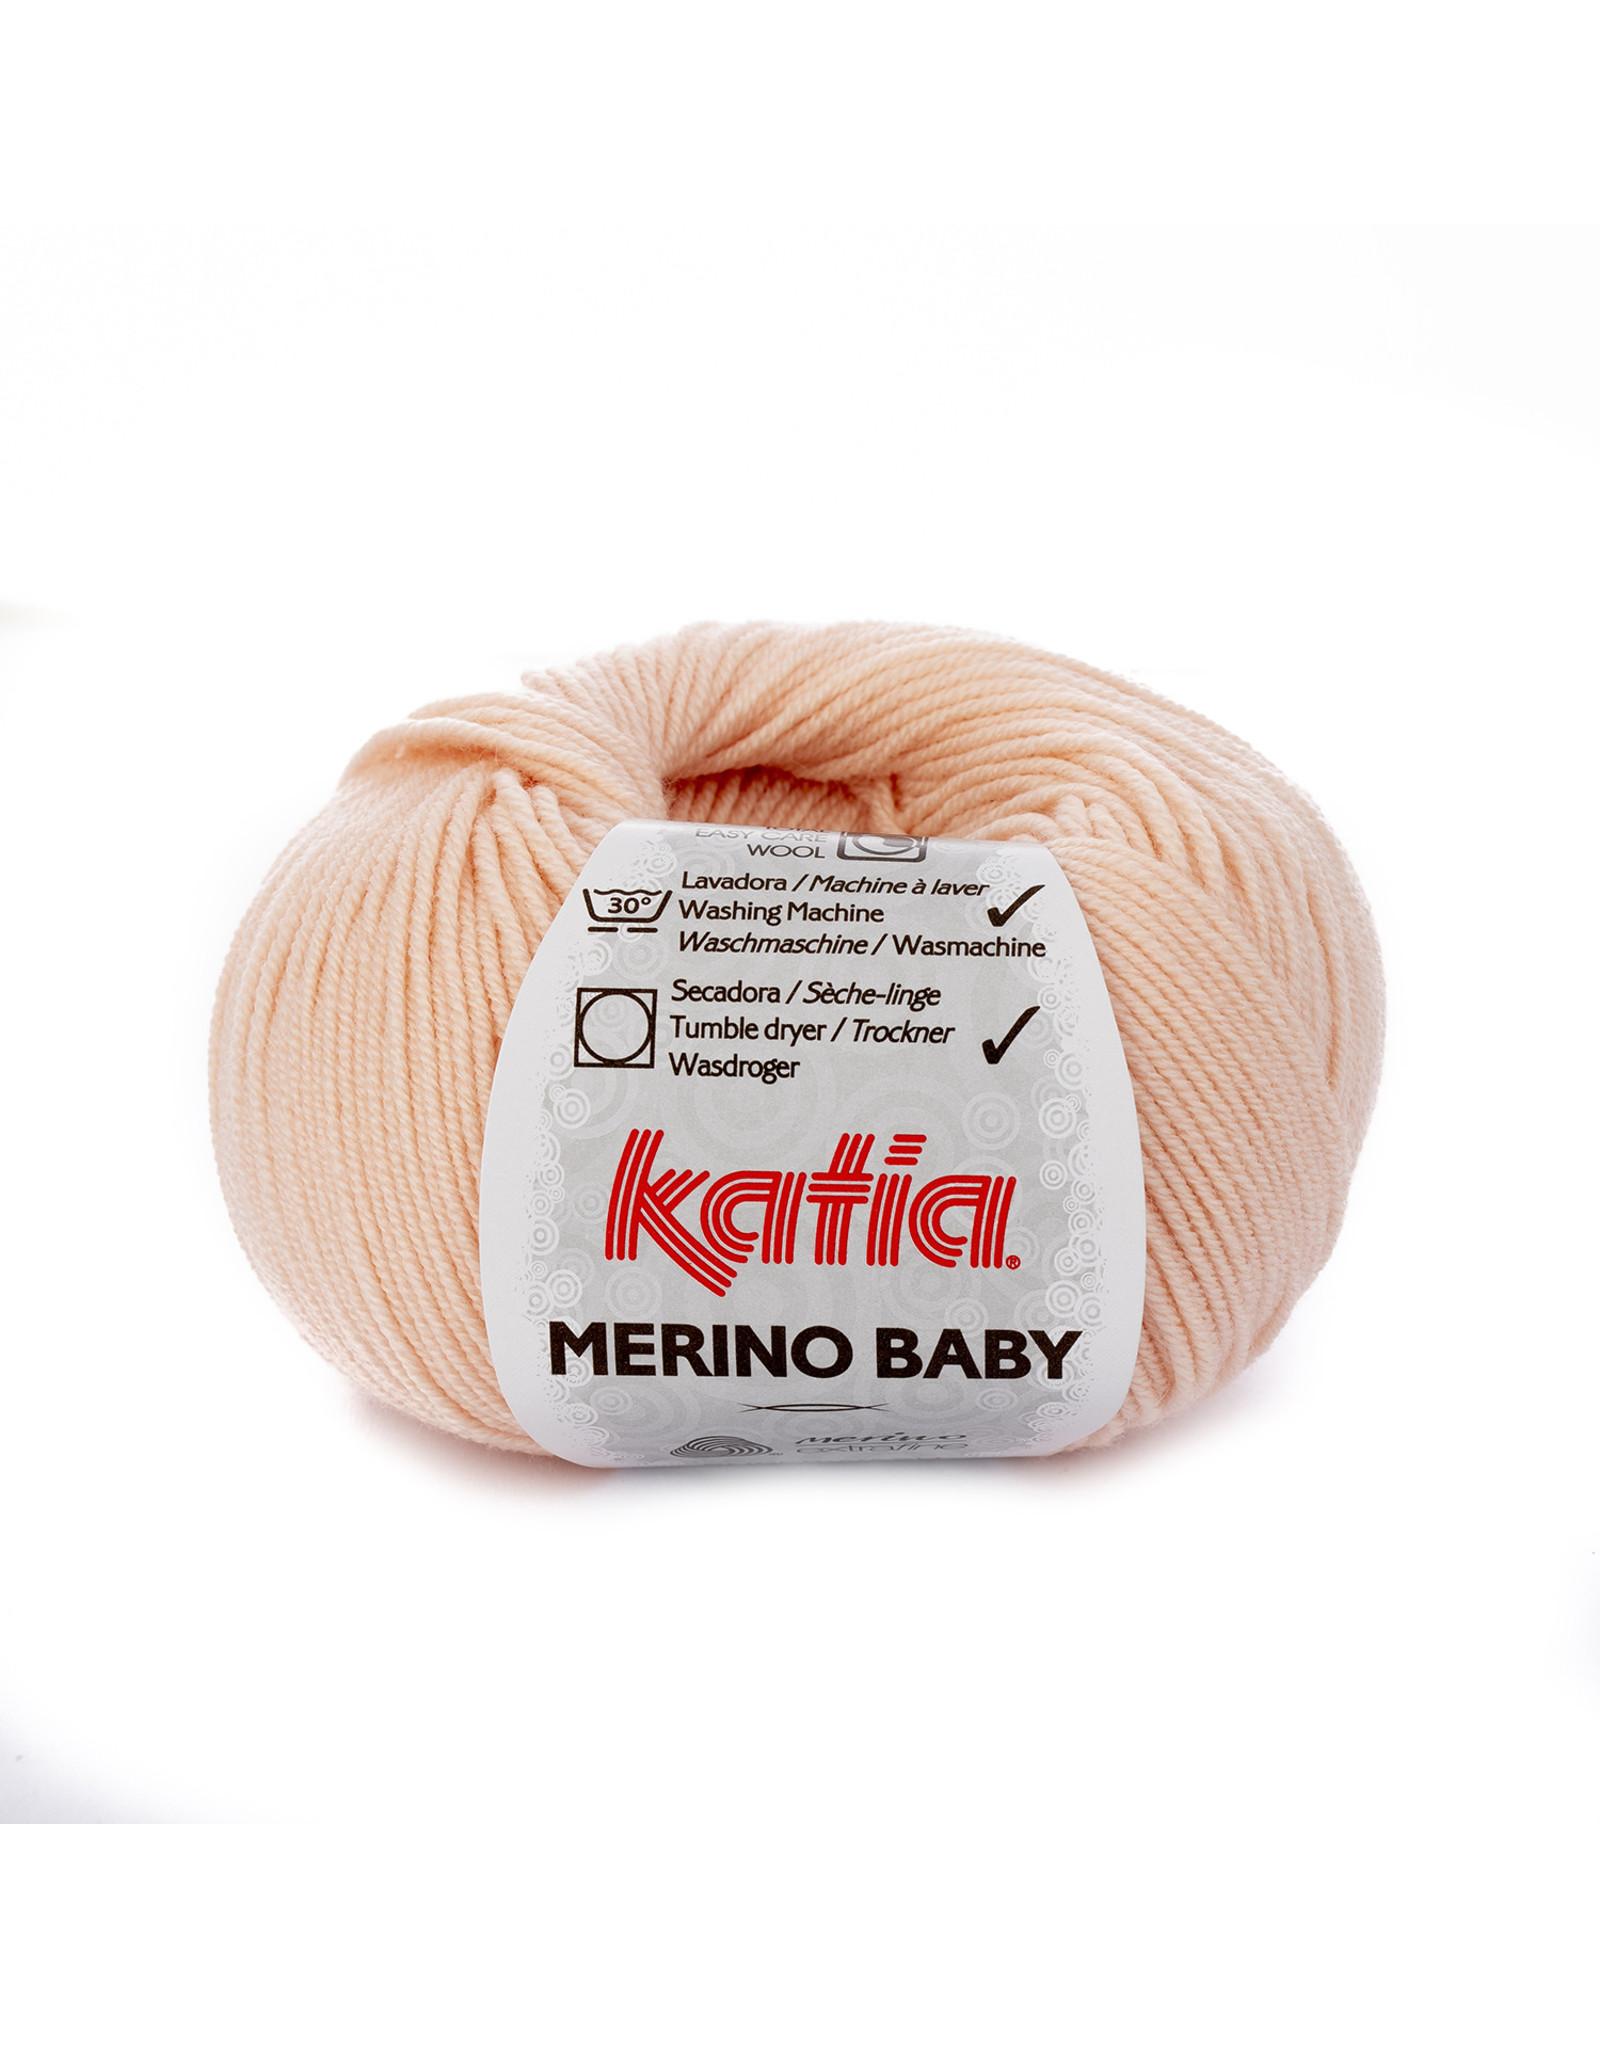 Katia Katia Merino Baby - kleur 81 - Zeer licht bleekrood - bundel 5 x 50 gr.